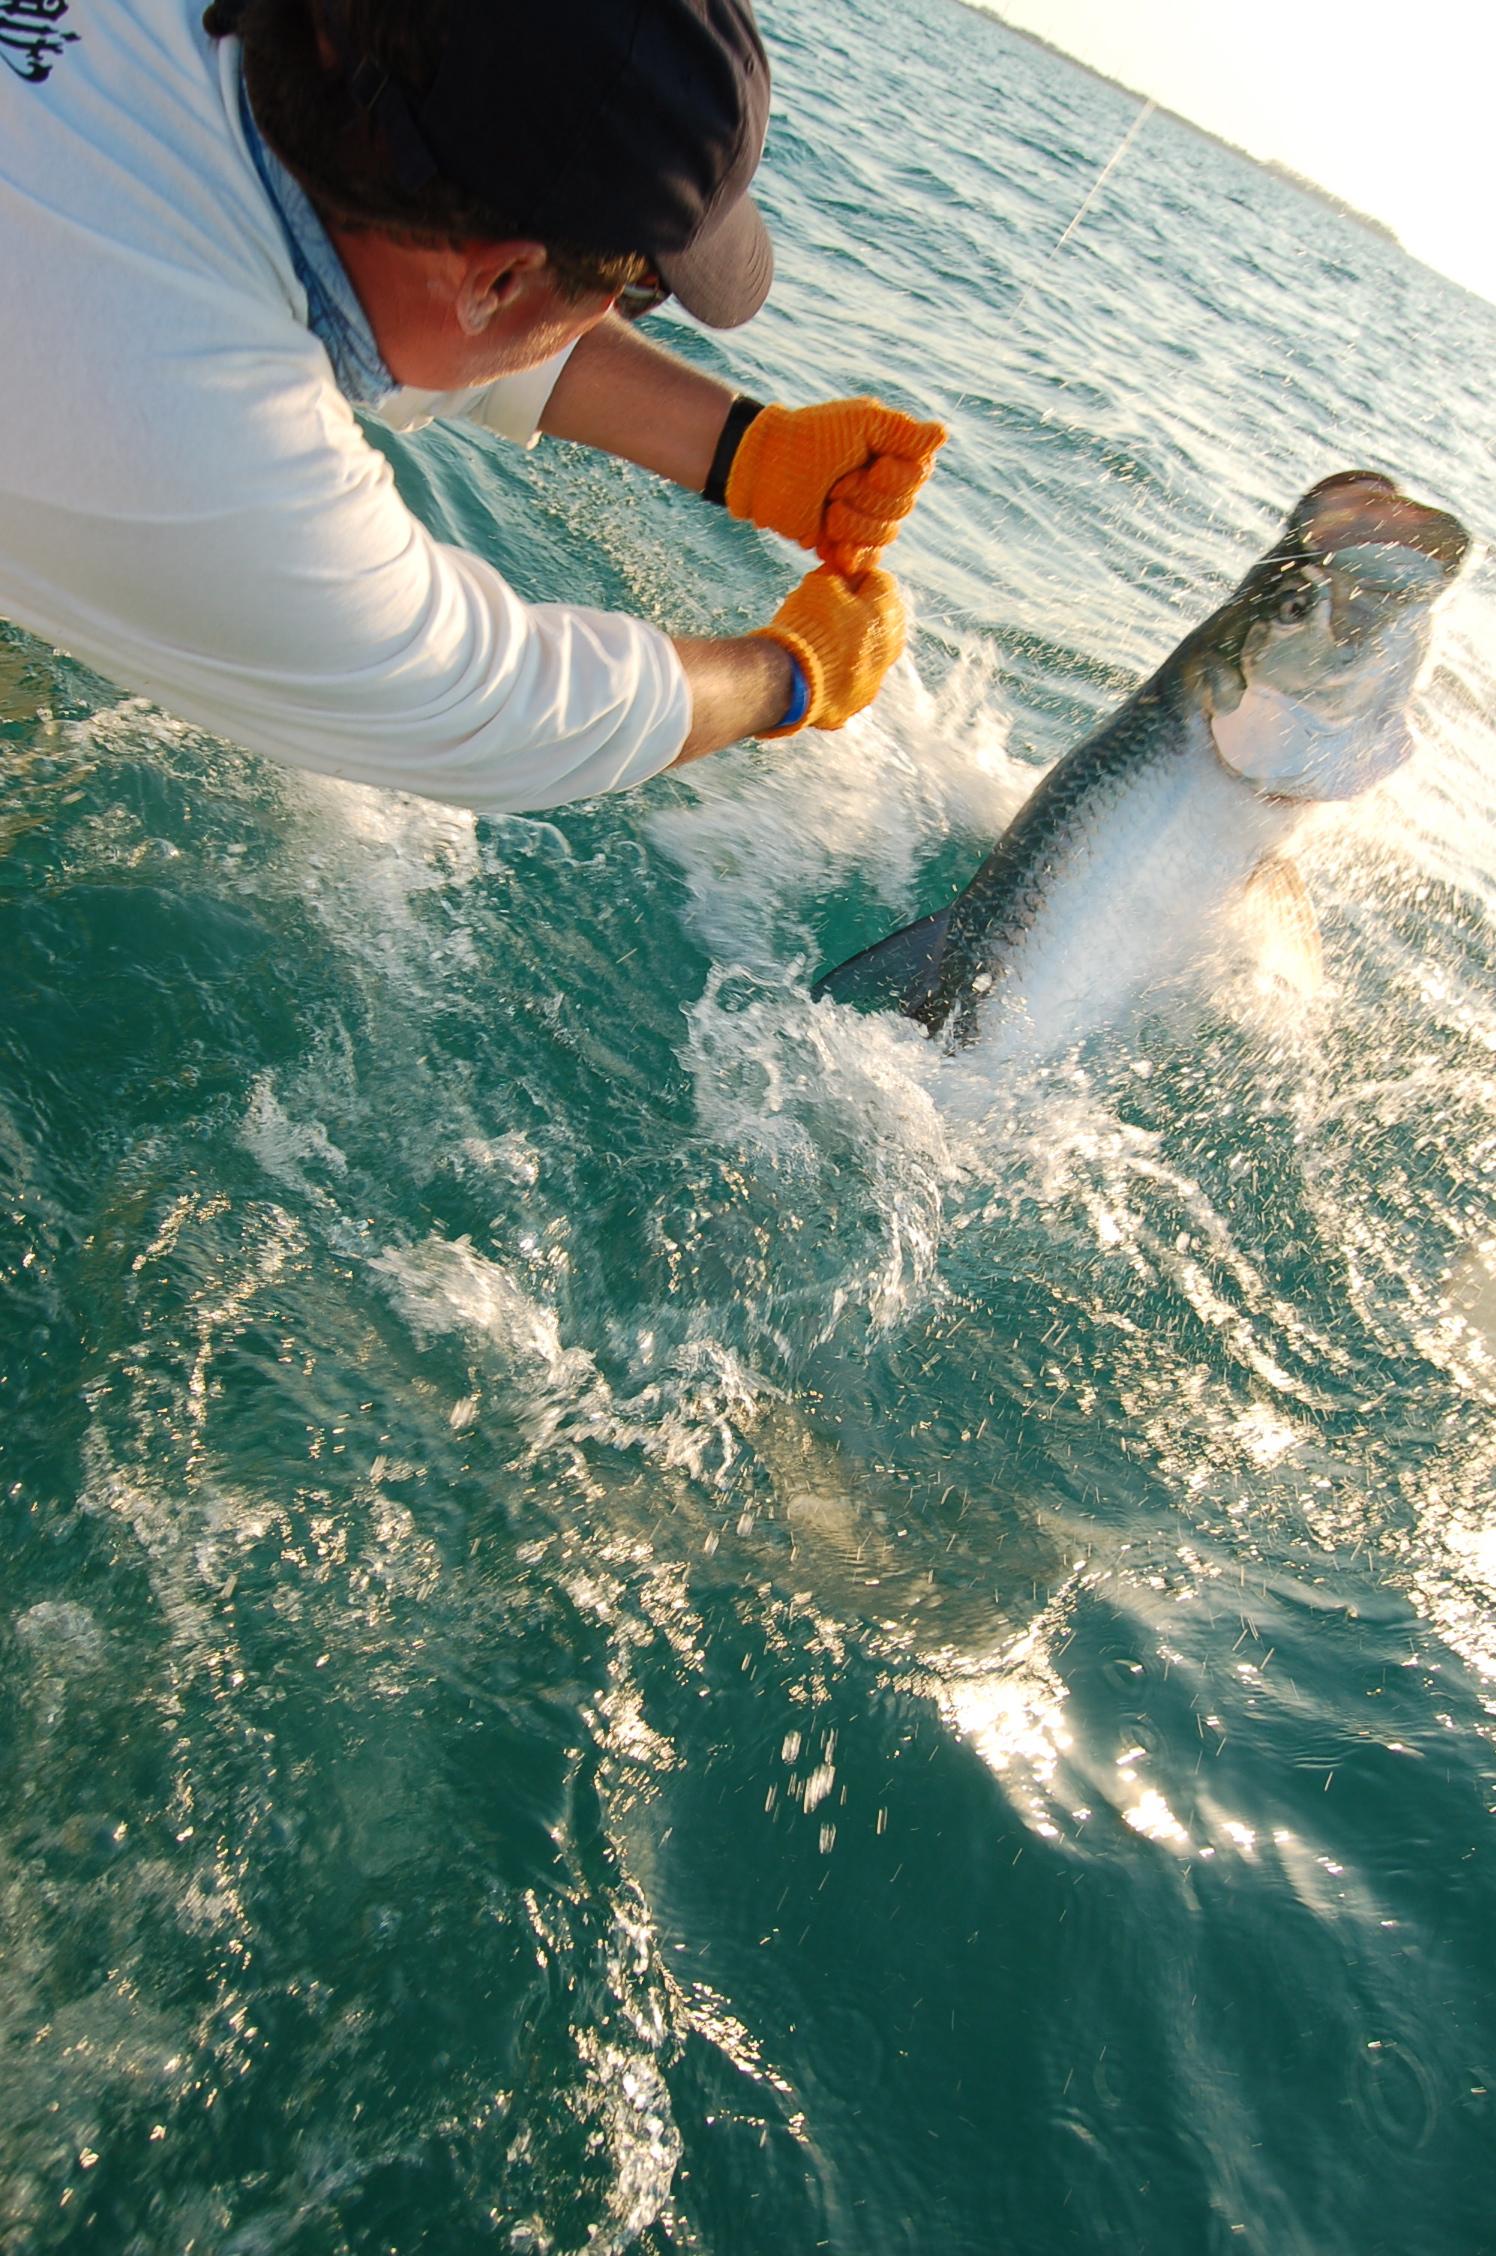 Florida keys fishing charters florida keys fishing charters for Florida keys fishing